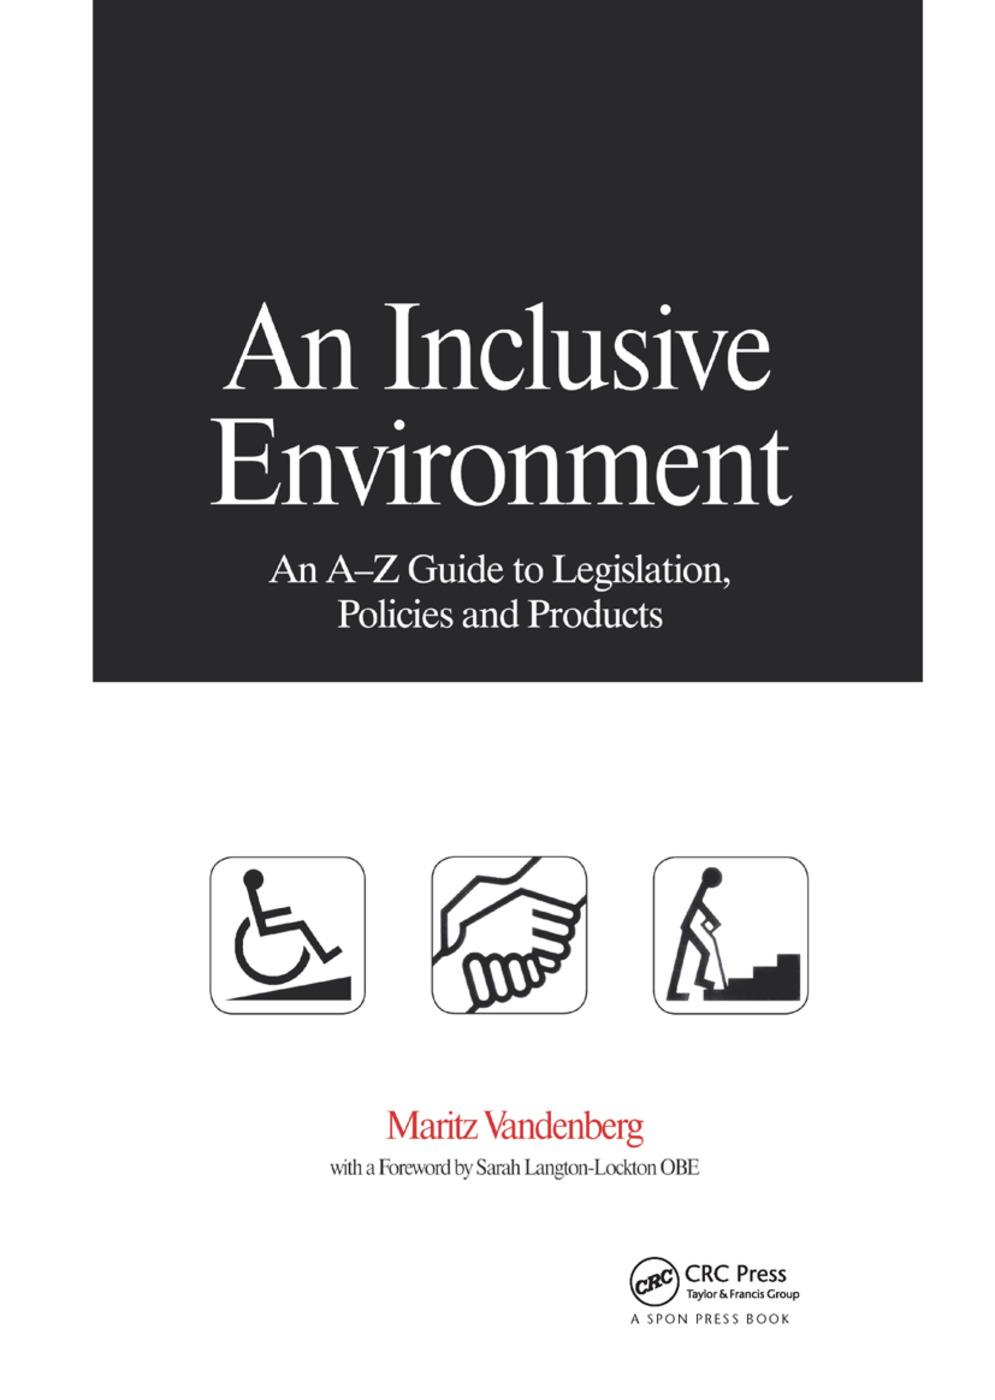 An Inclusive Environment book cover